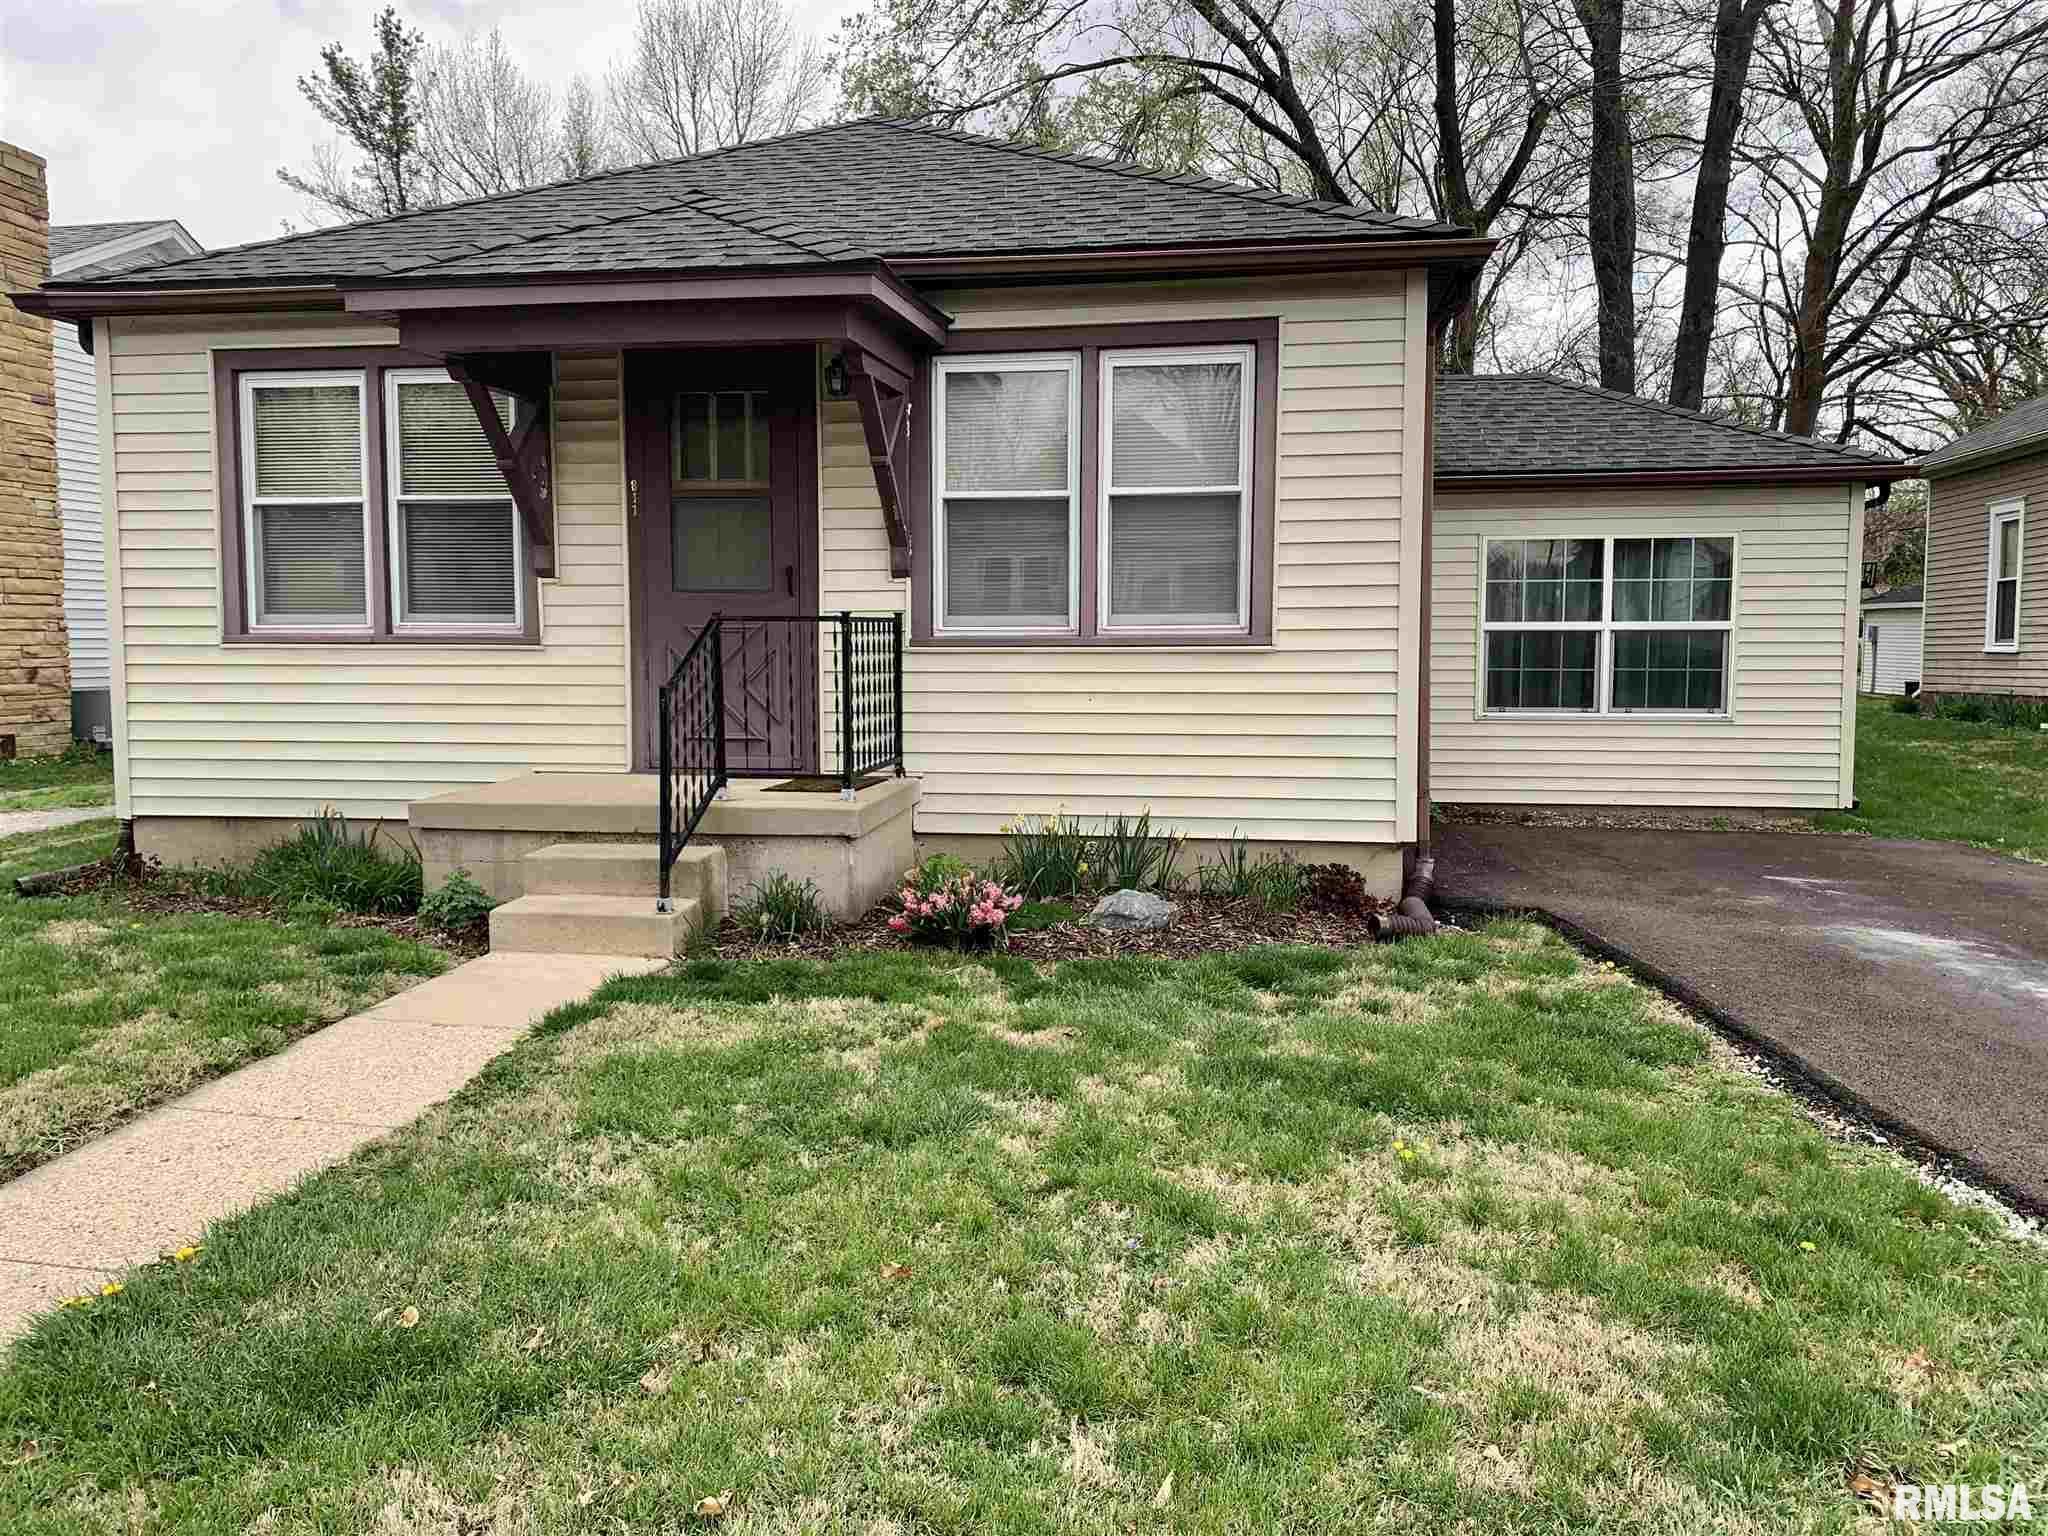 811 MONROE Property Photo - Pawnee, IL real estate listing